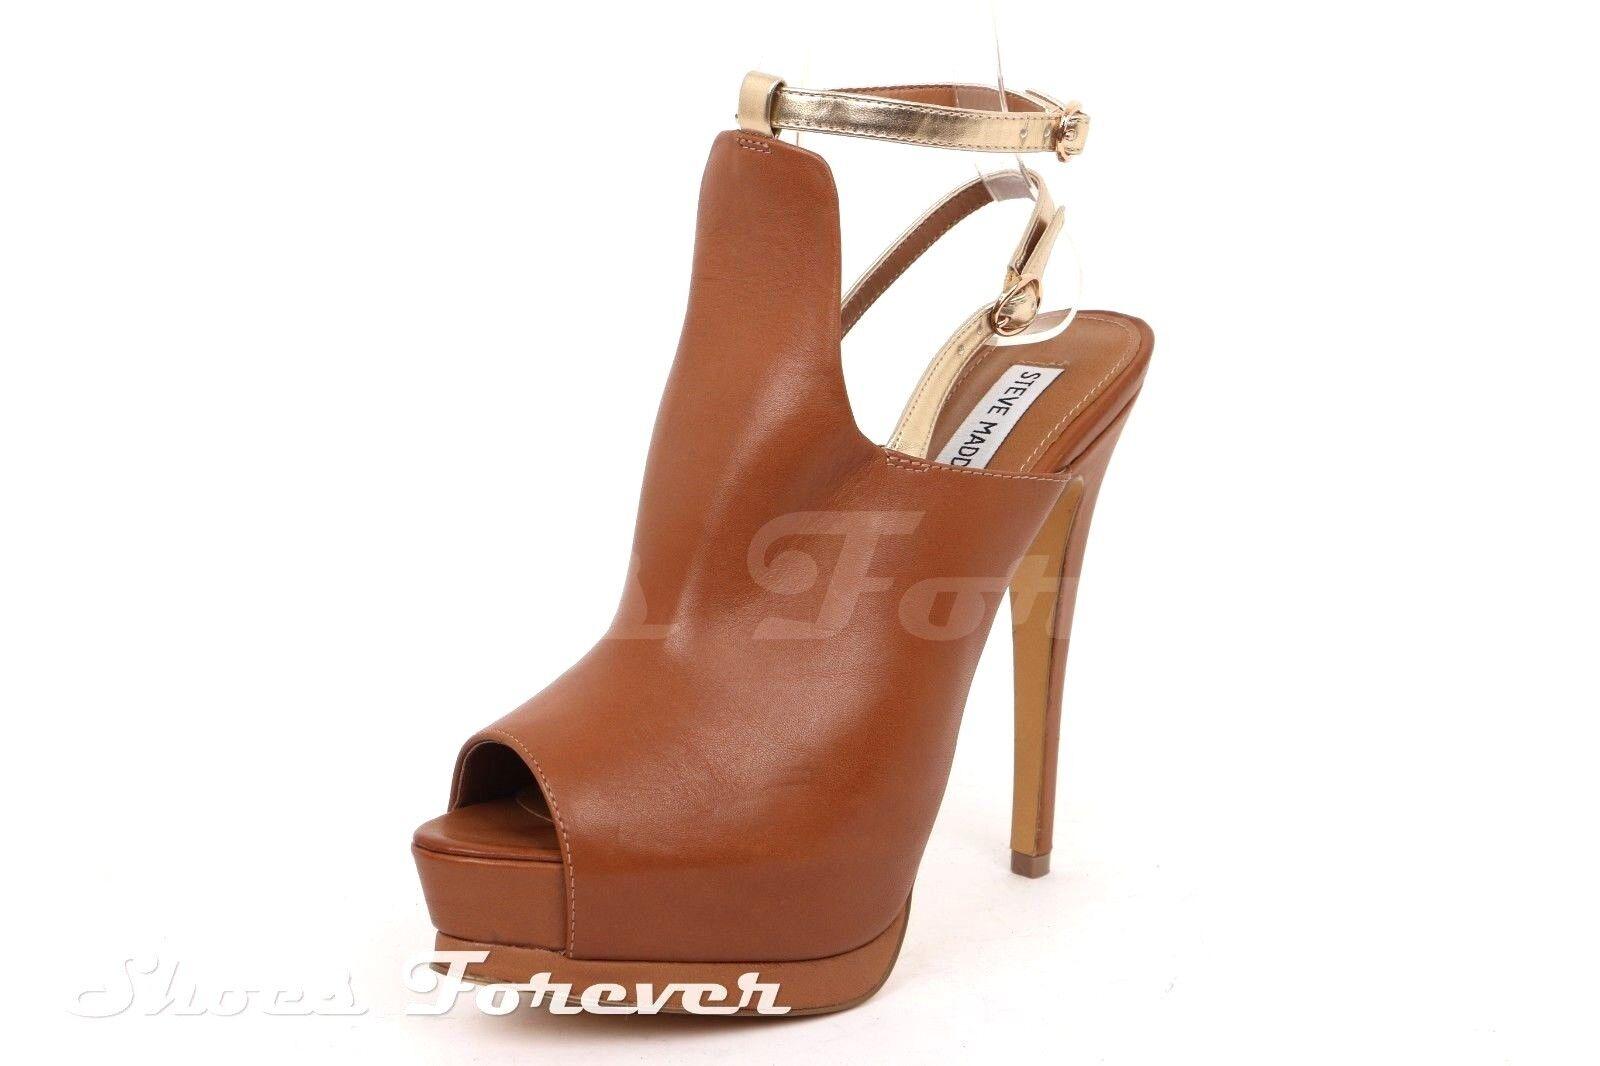 Damenschuhe STEVE MADDEN Braun / gold Leder ankle strap platforms sz. 9 M NEU